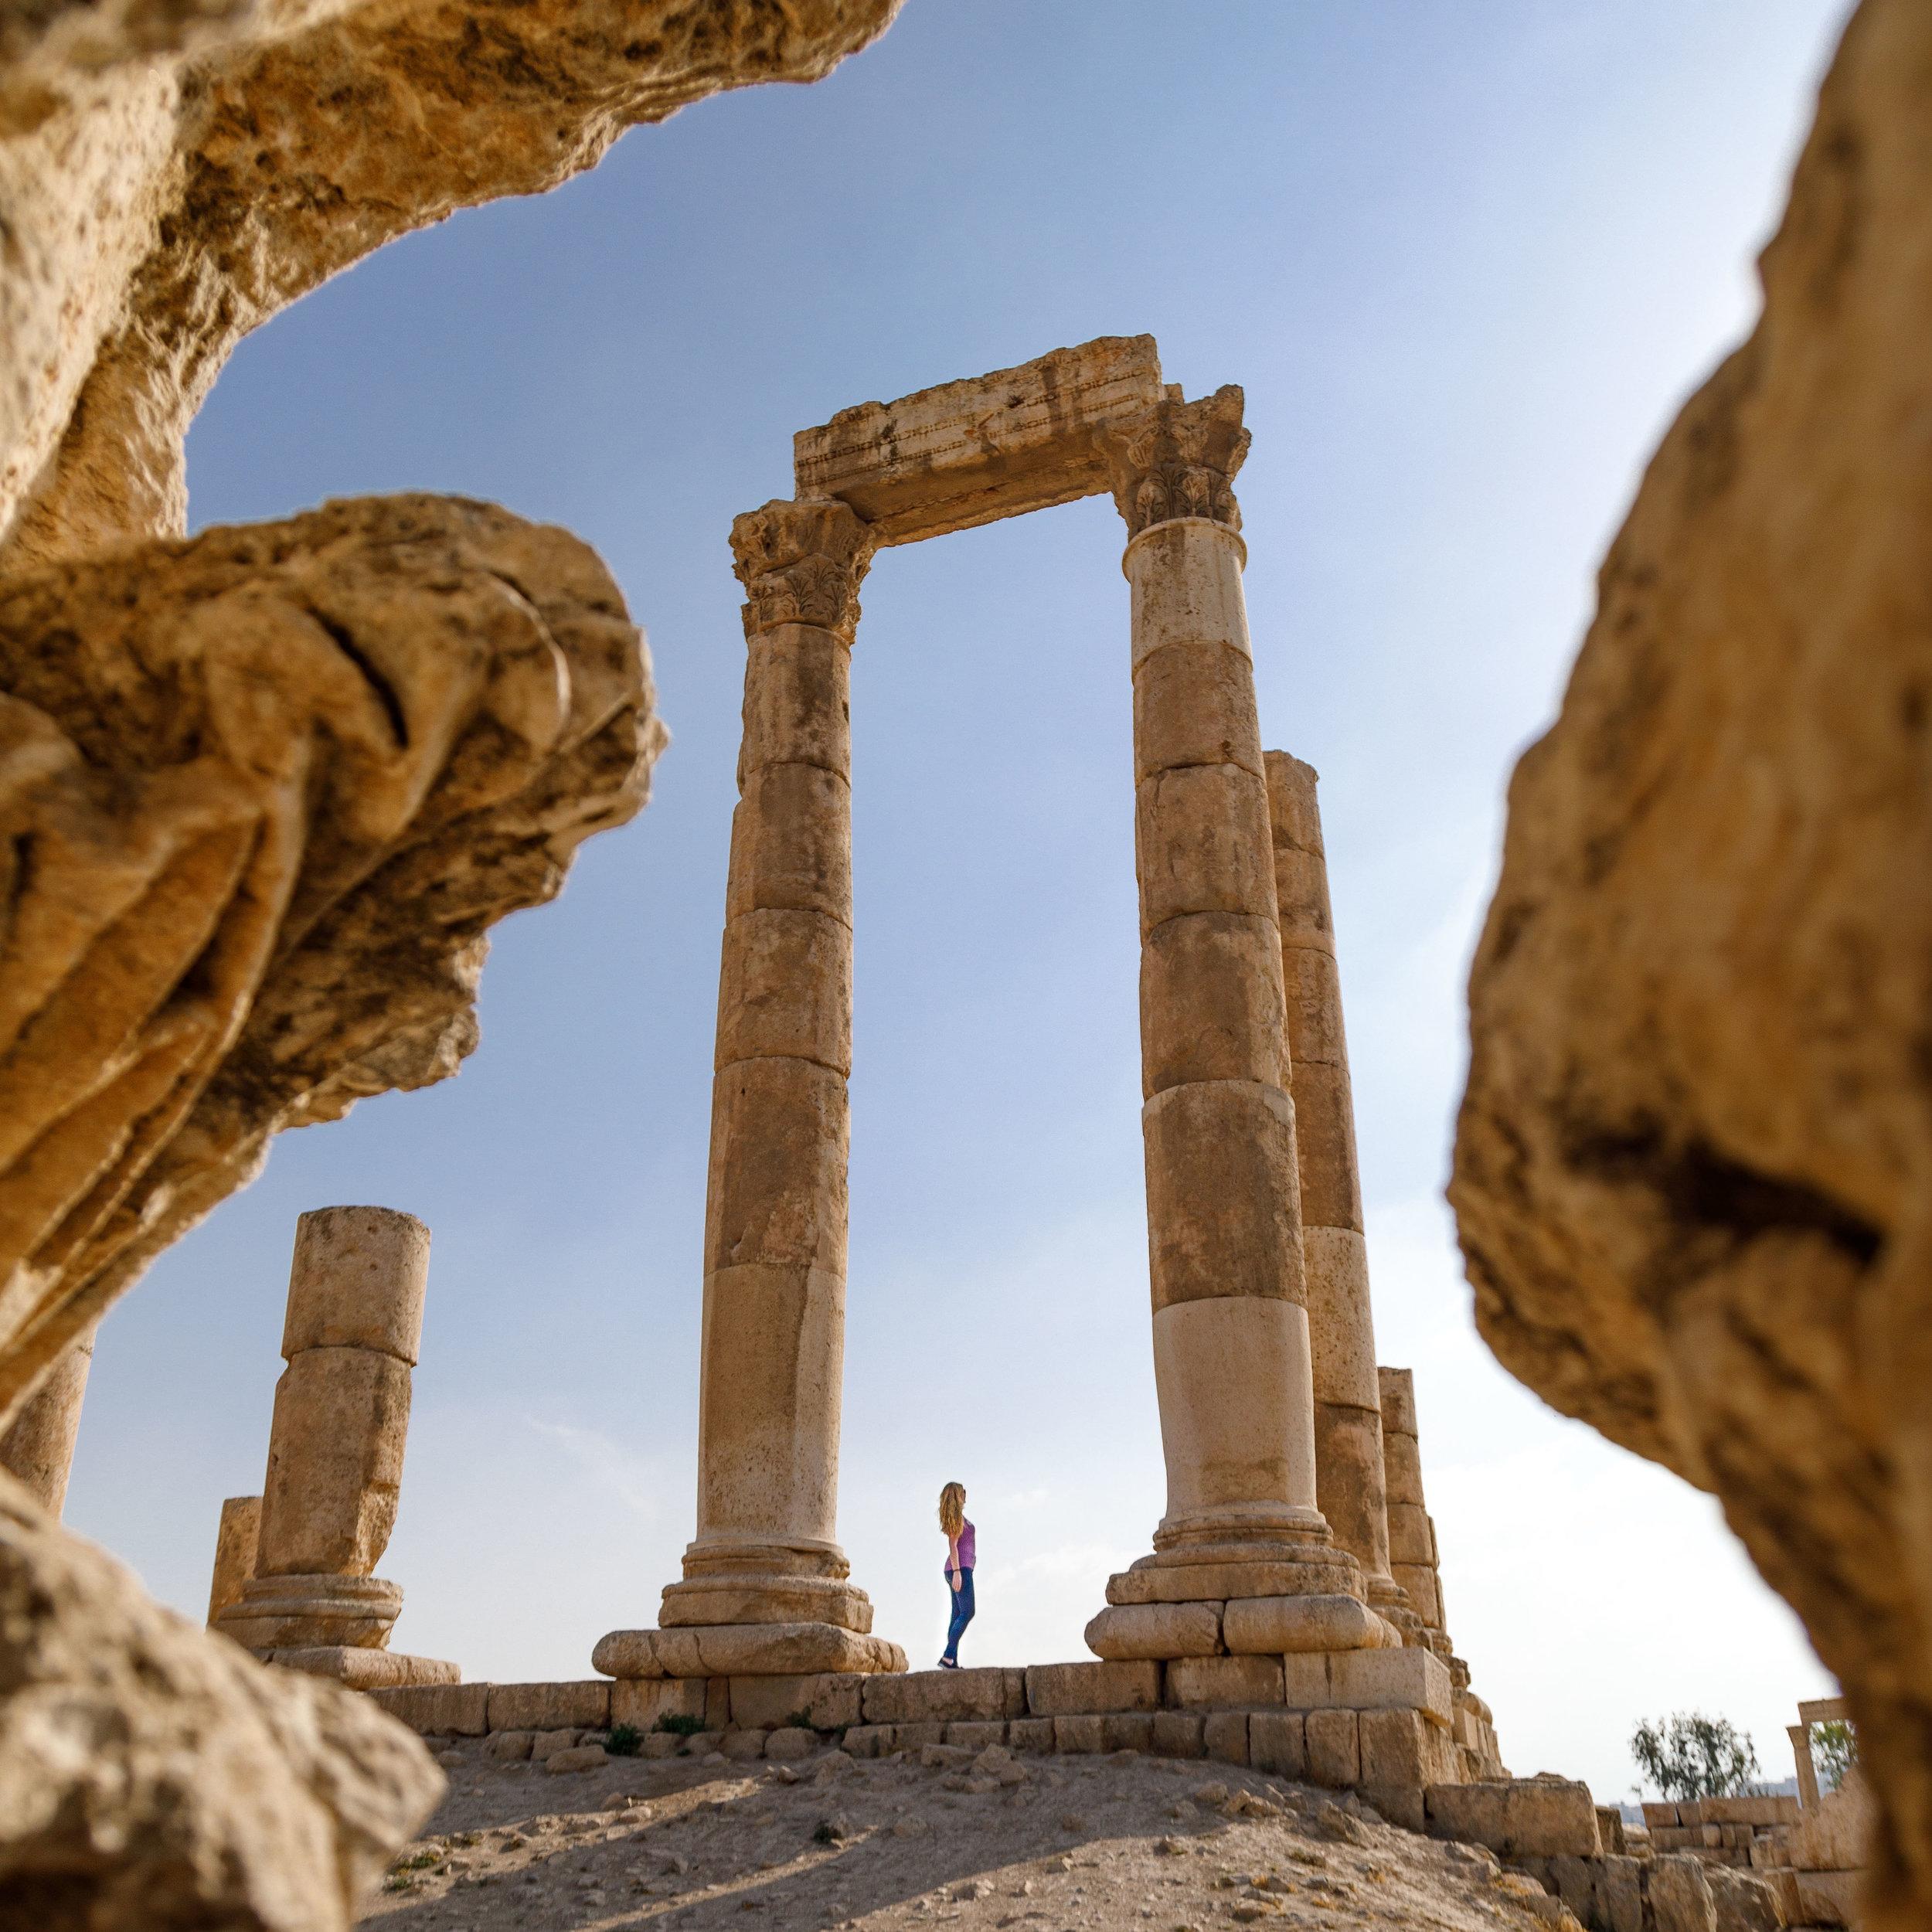 The Citadel Amman Entry Price